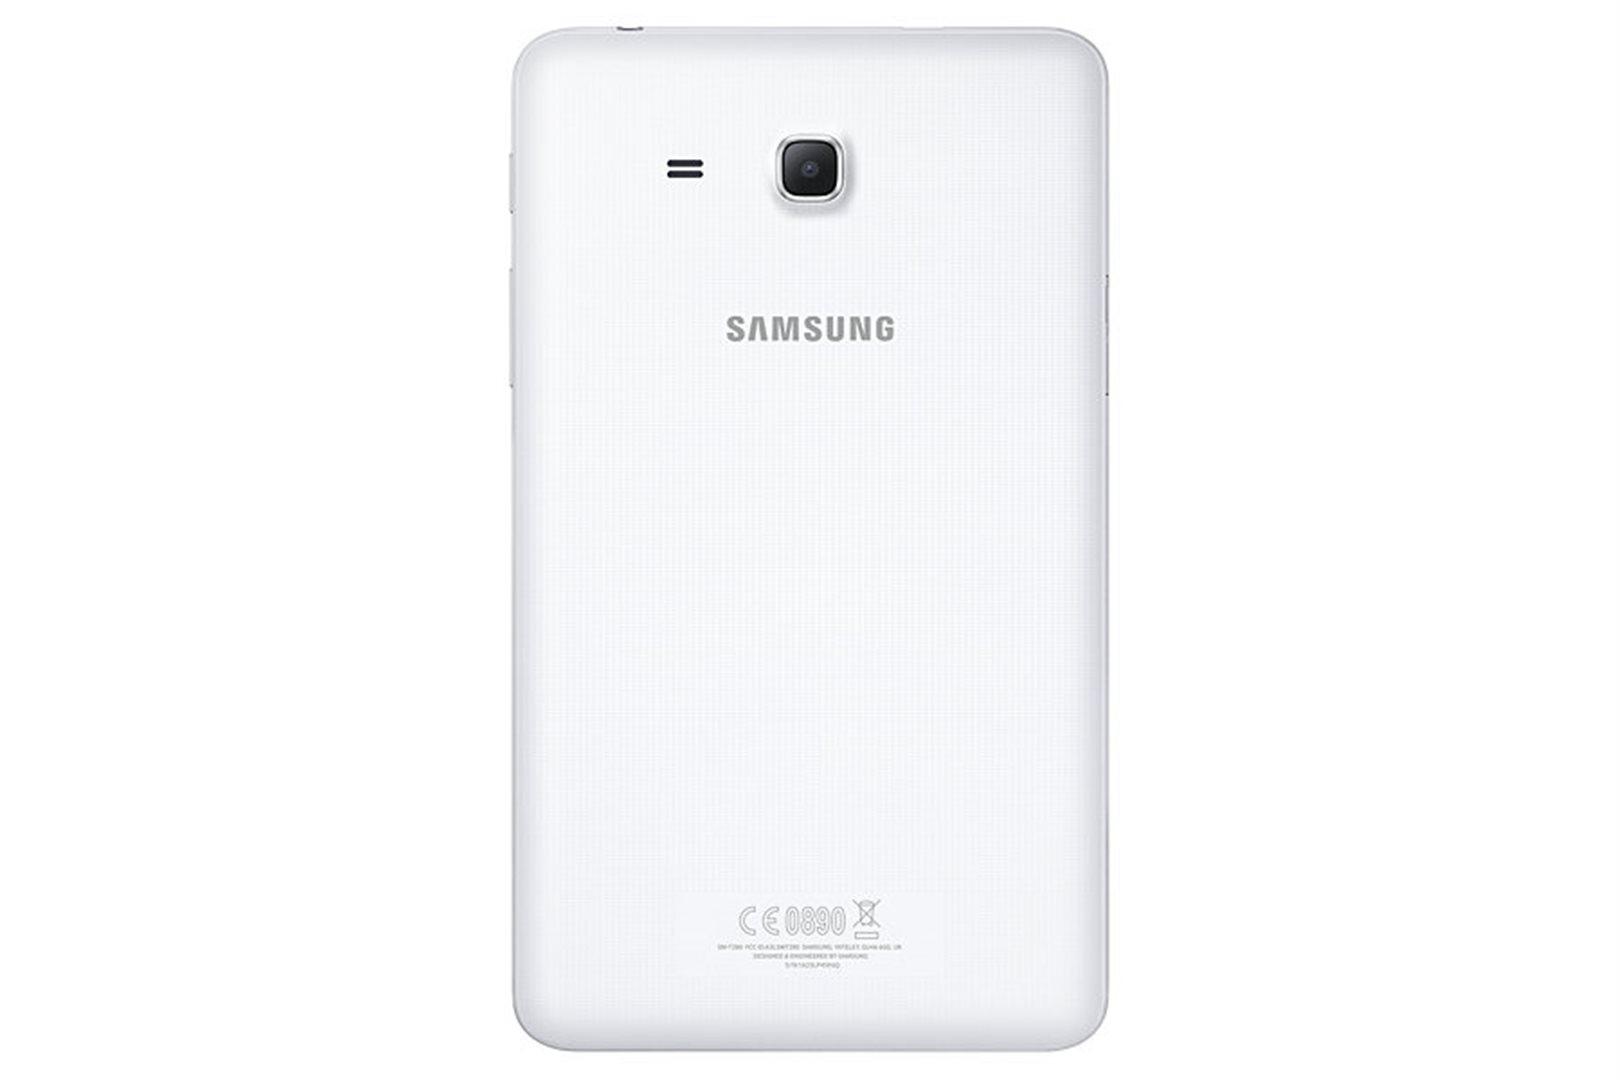 Samsung Galaxy Tab A 7 SM-T280 8GB White